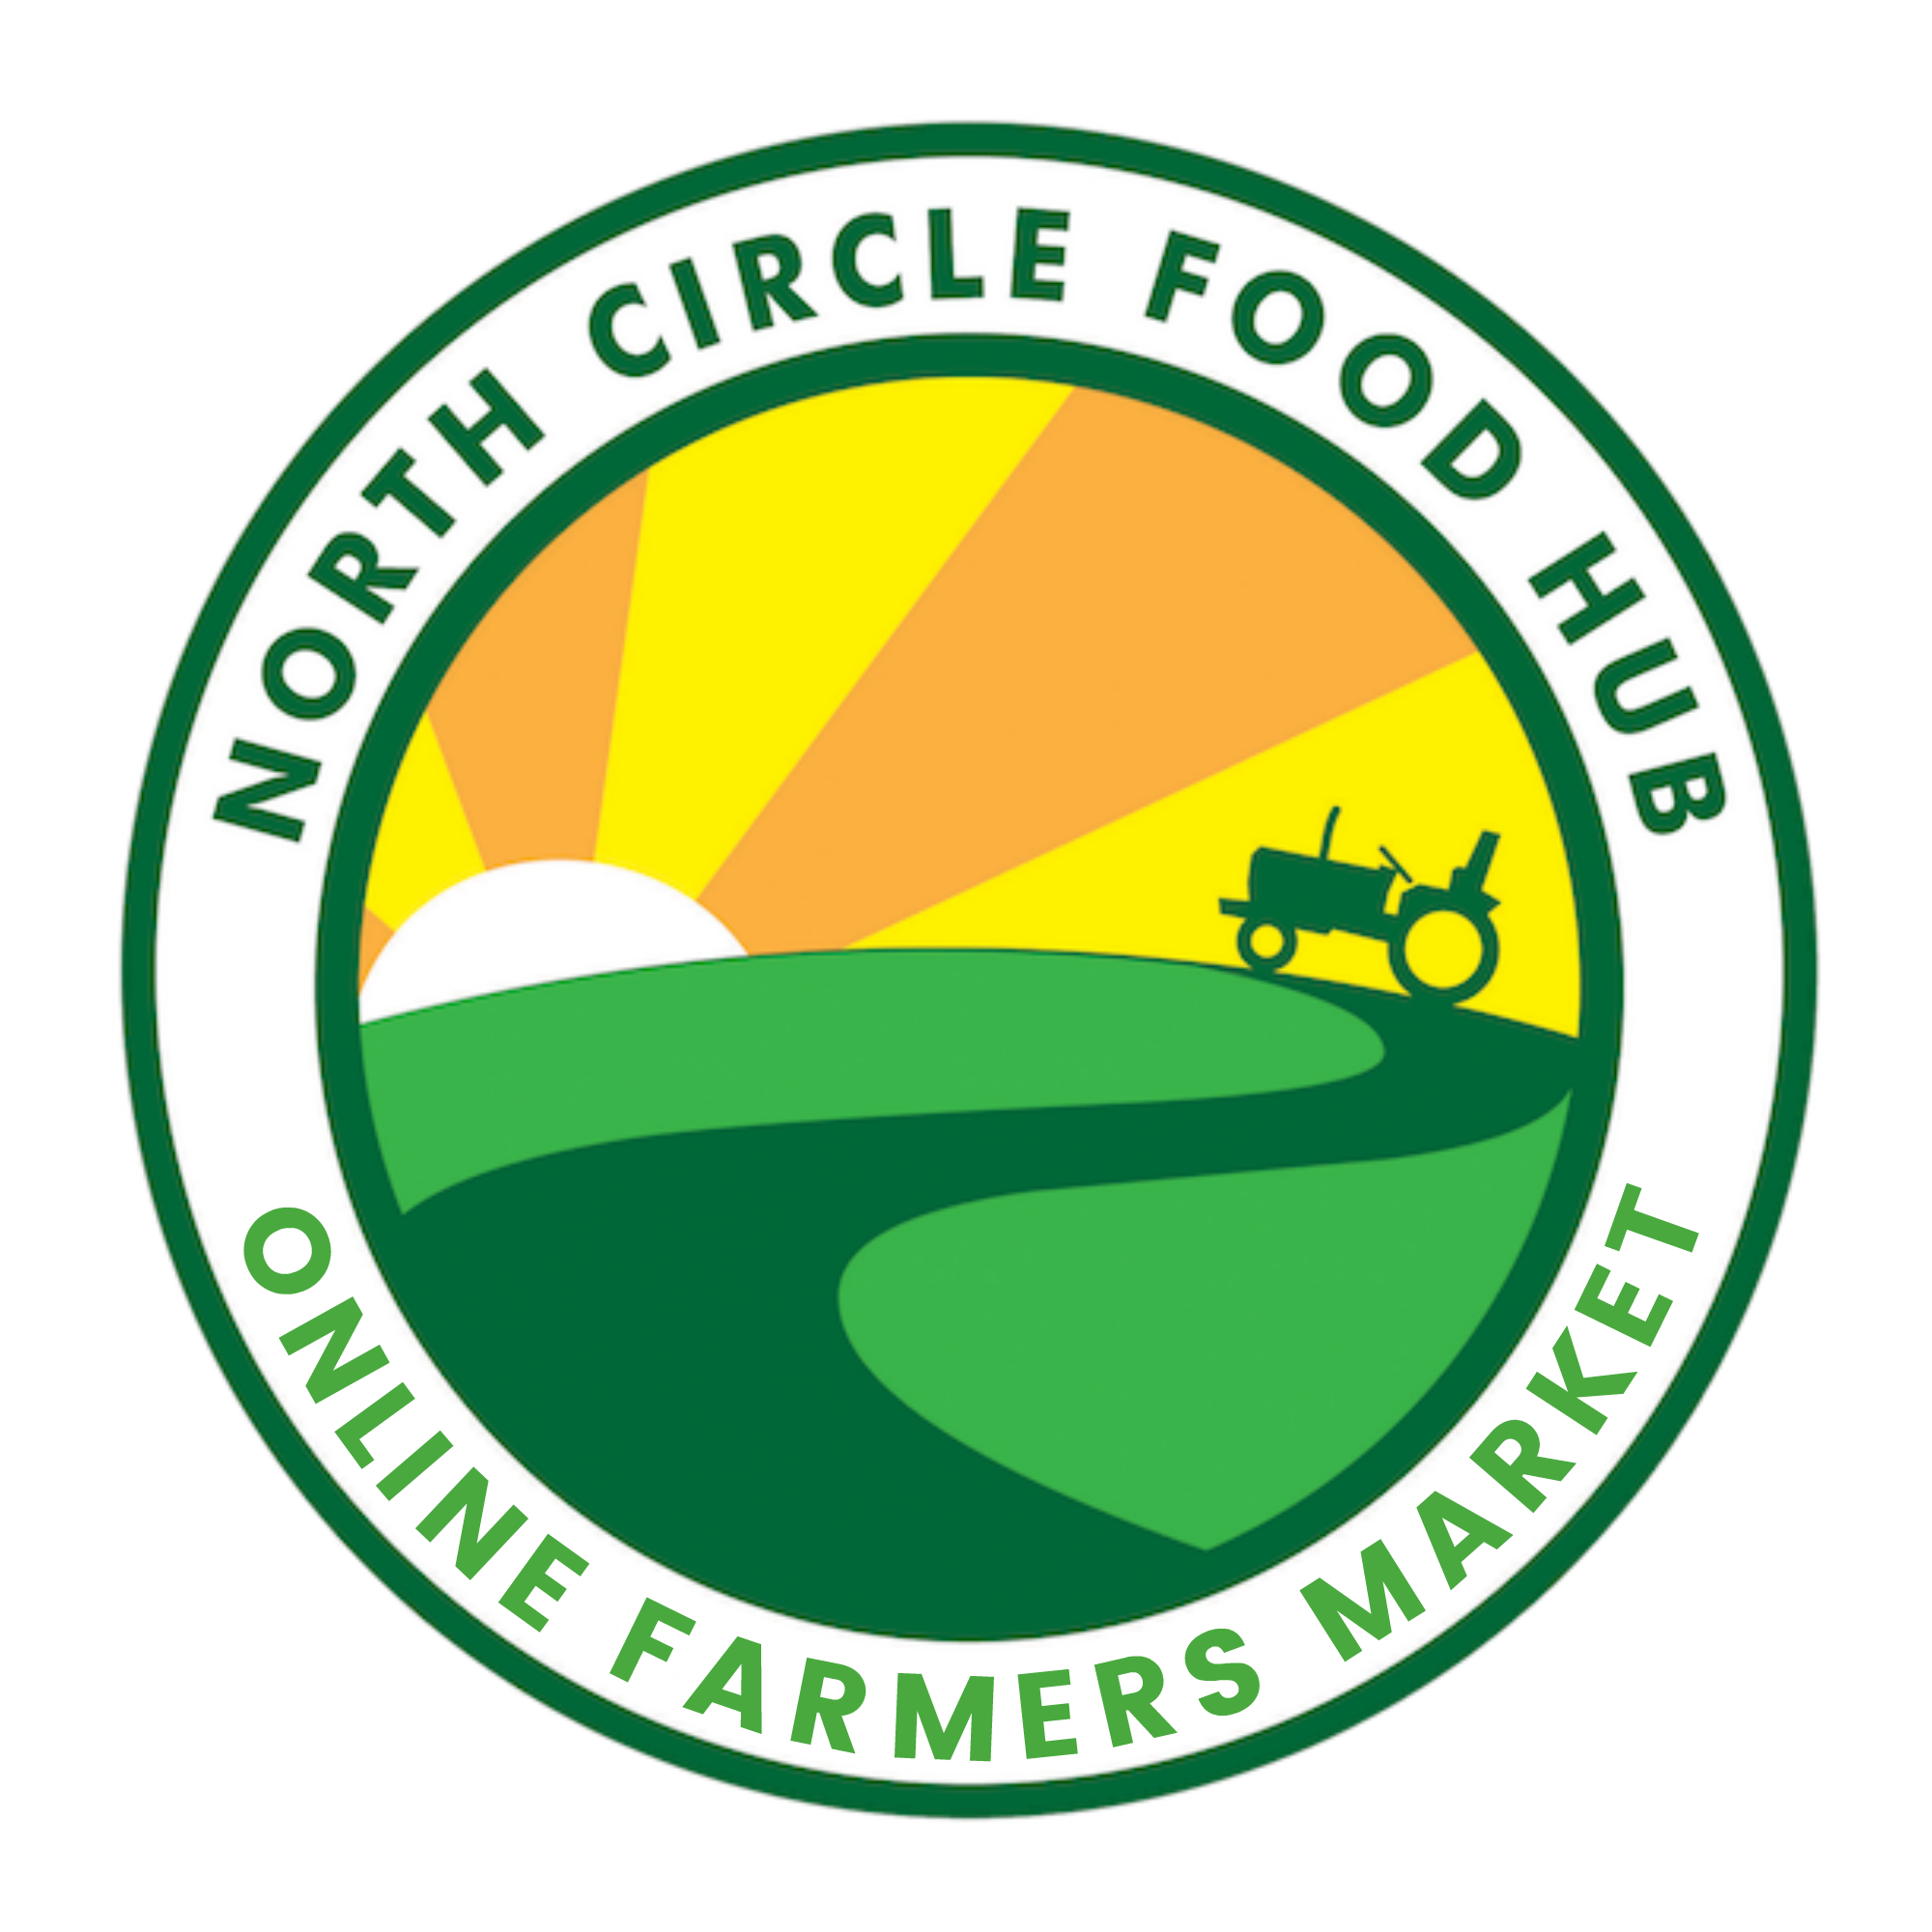 Land clipart agrarian. Our farmers north circle